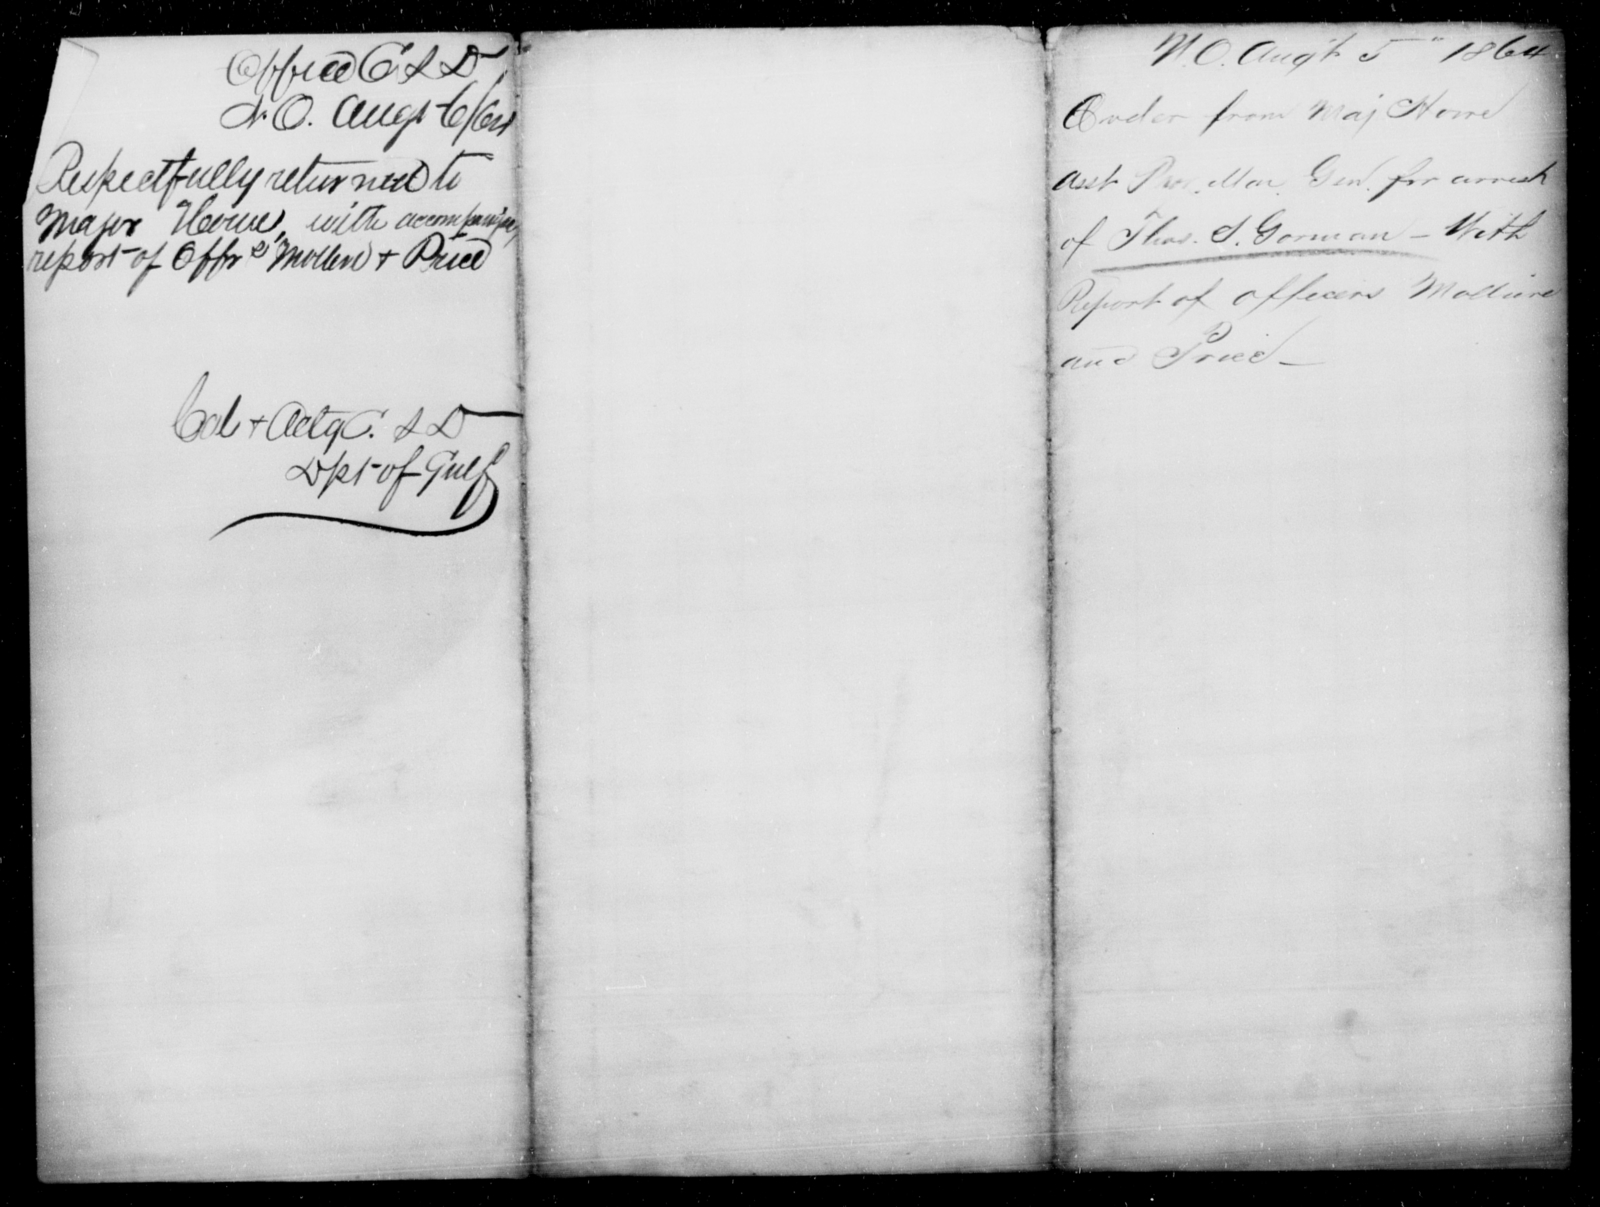 Gorman, Thos S - State: [Blank] - Year: 1864